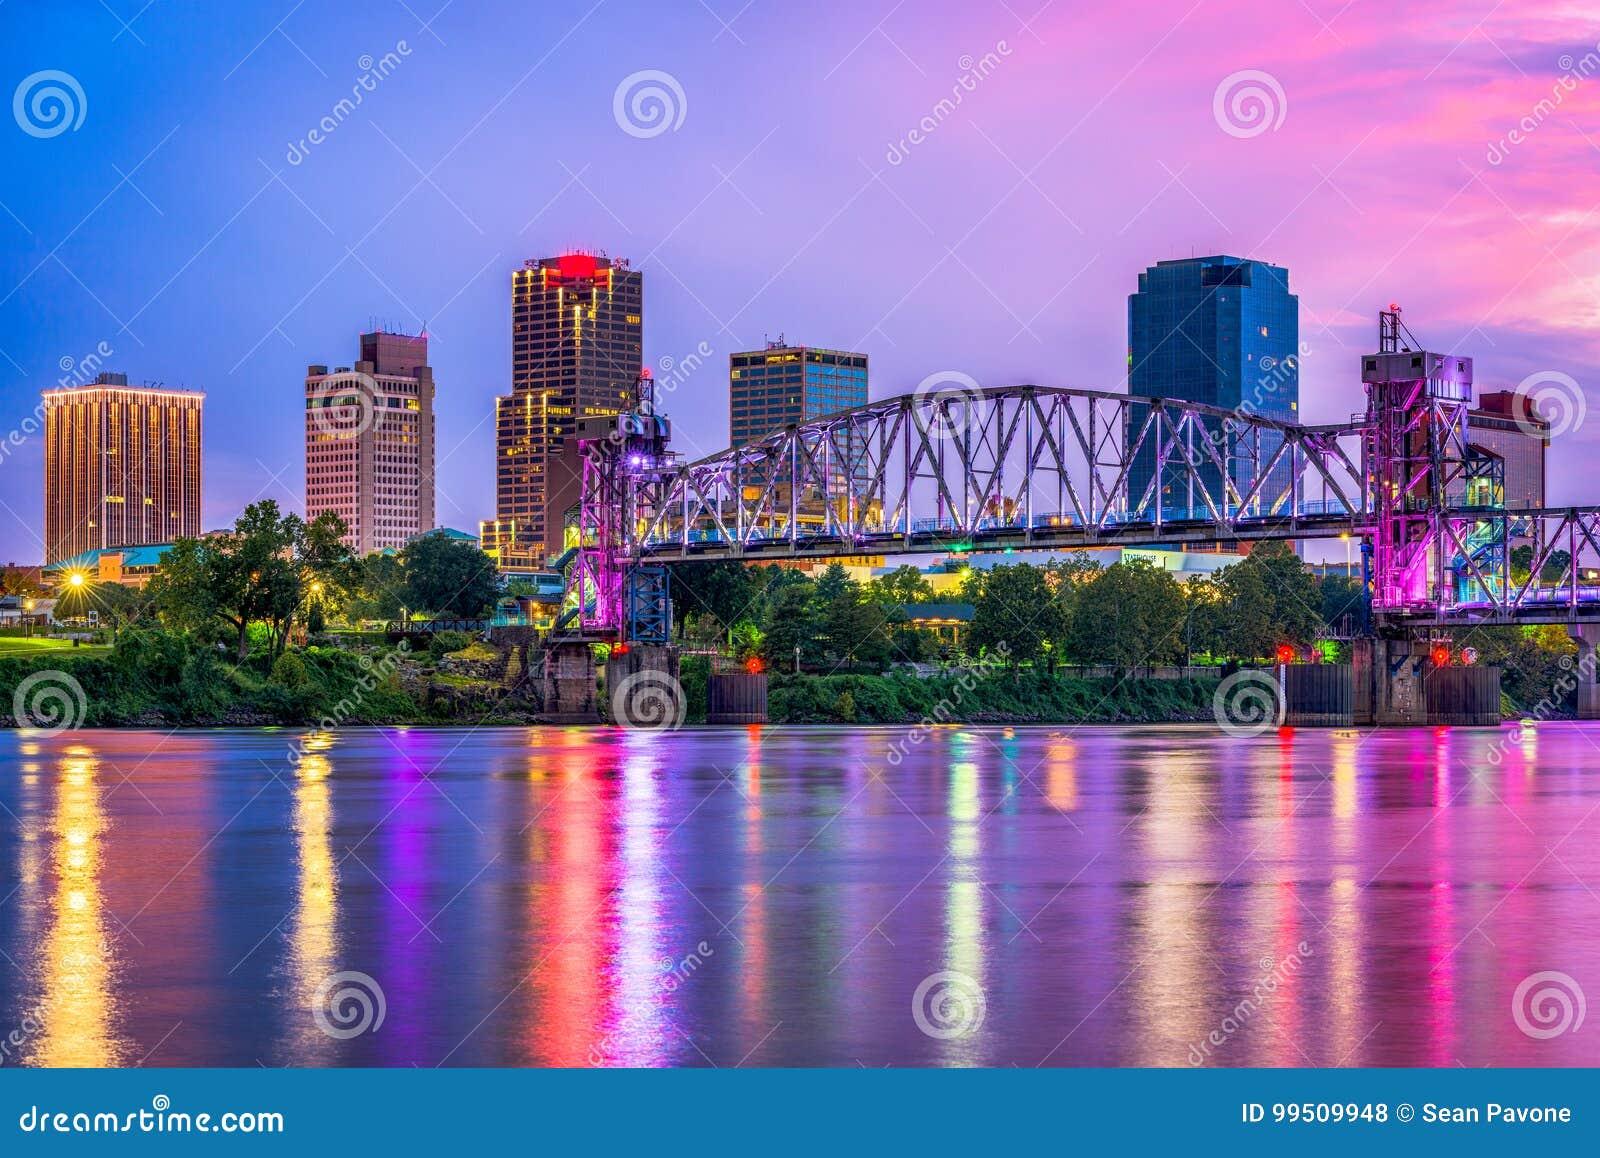 Little Rock, Arkansas, U.S.A.